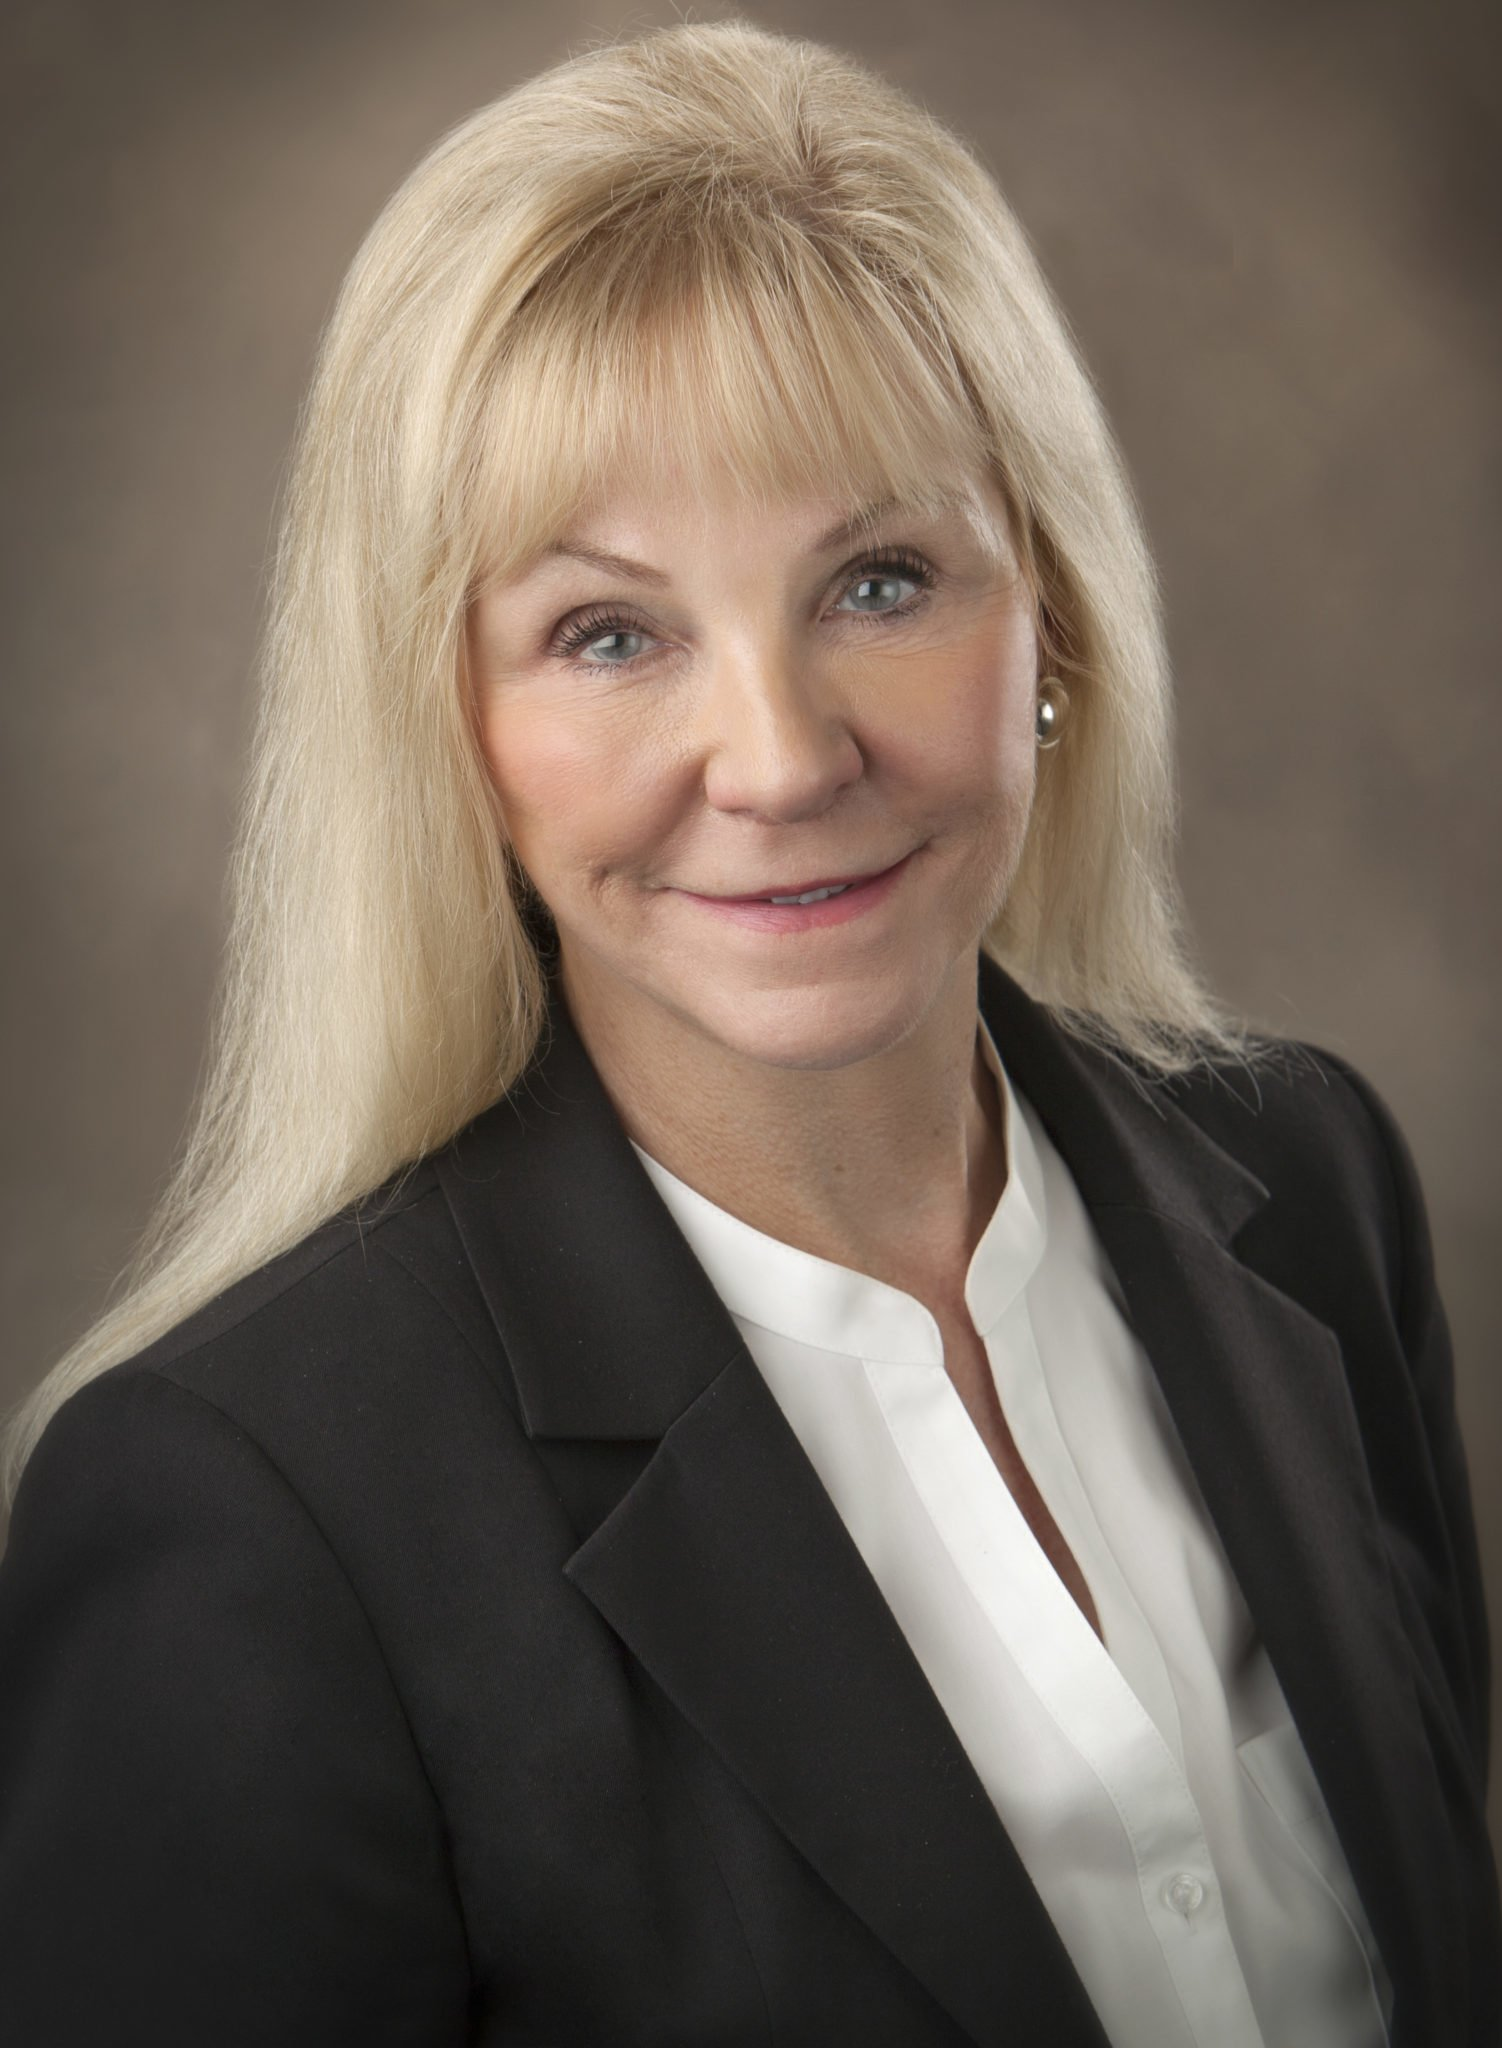 Diane Quigley